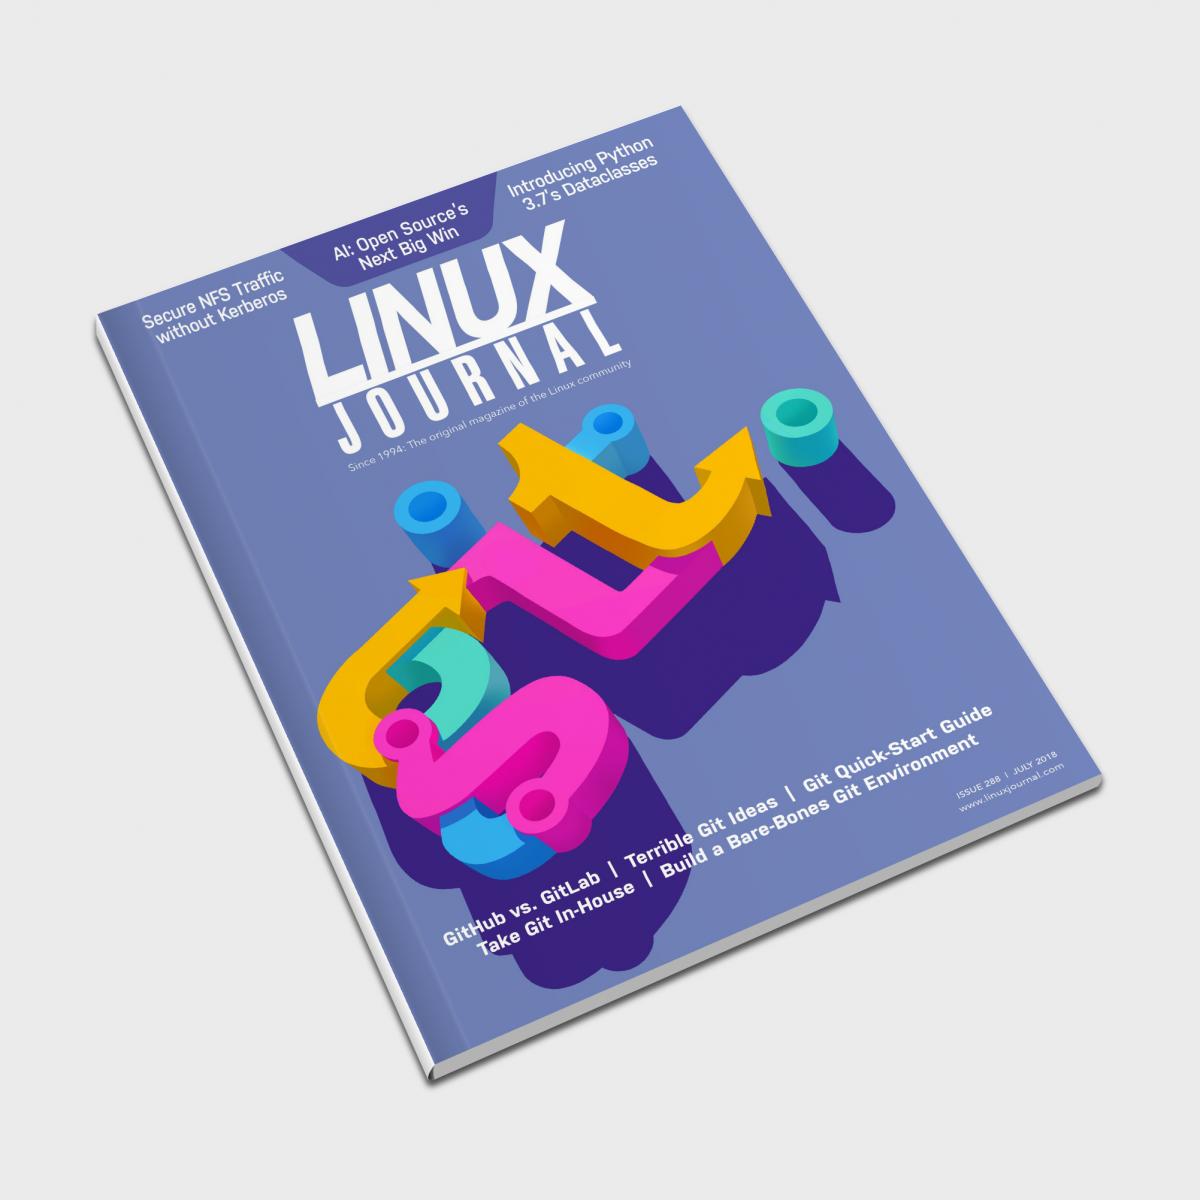 Linux Journal 'Git' Cover